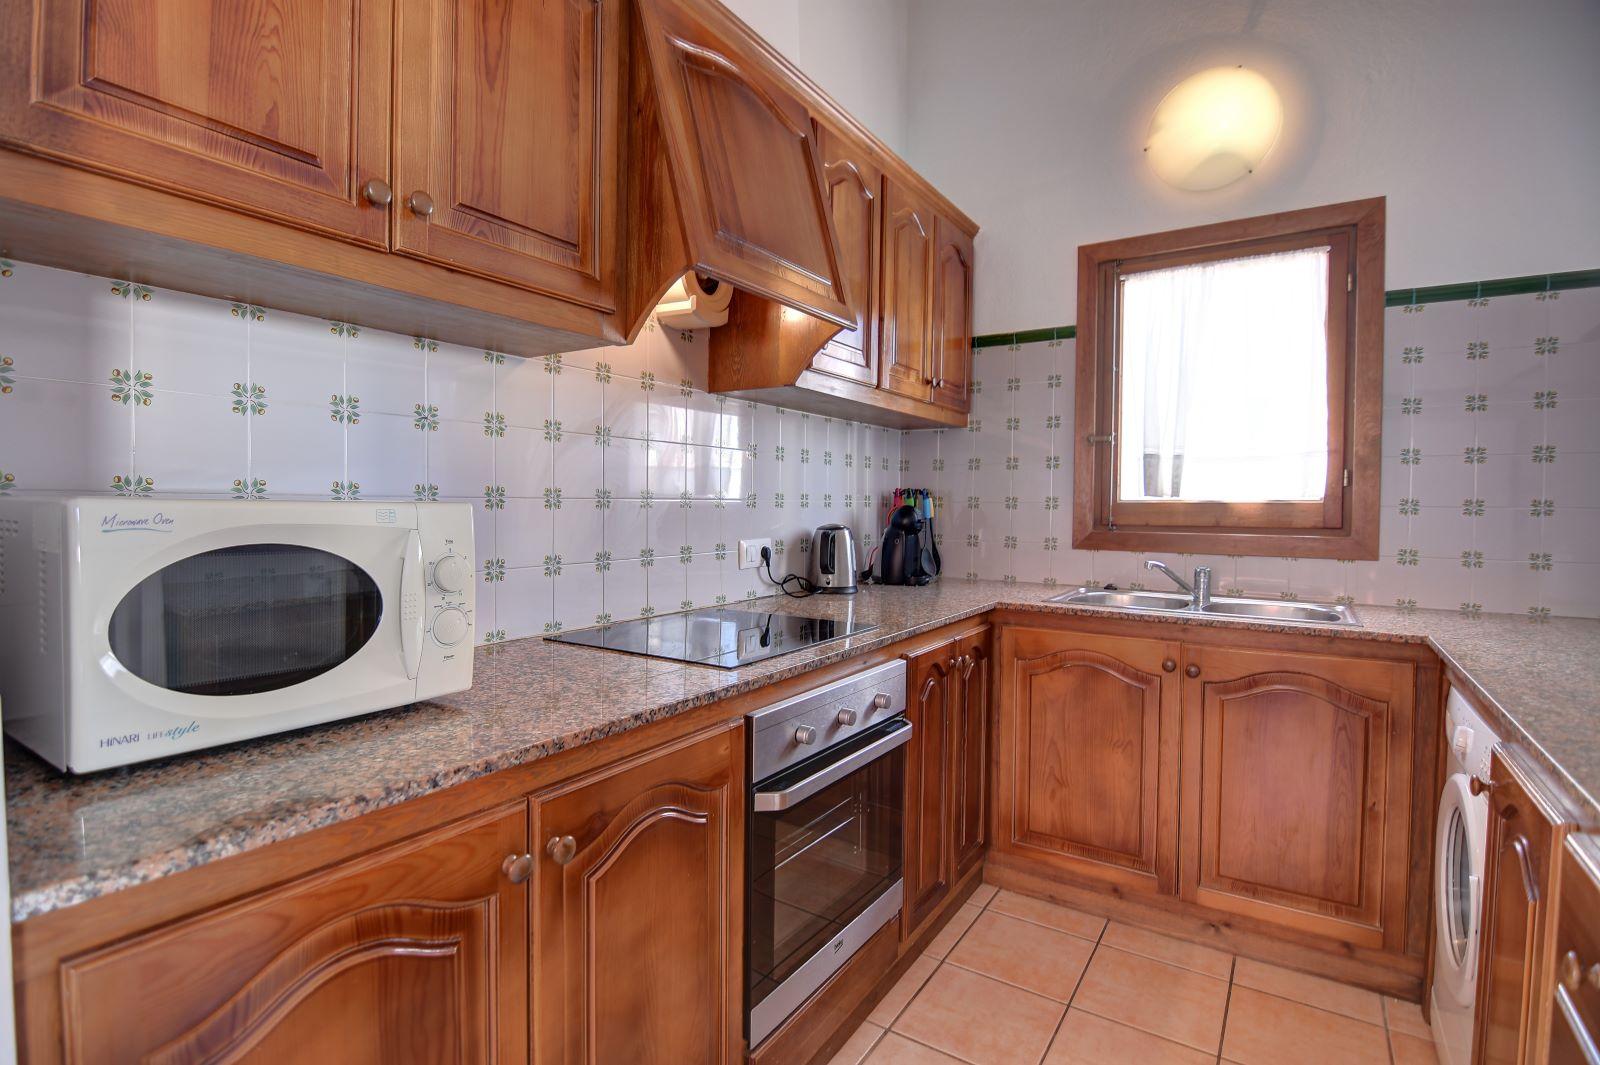 Villa in Cap D'Artruitx Ref: H2589 5